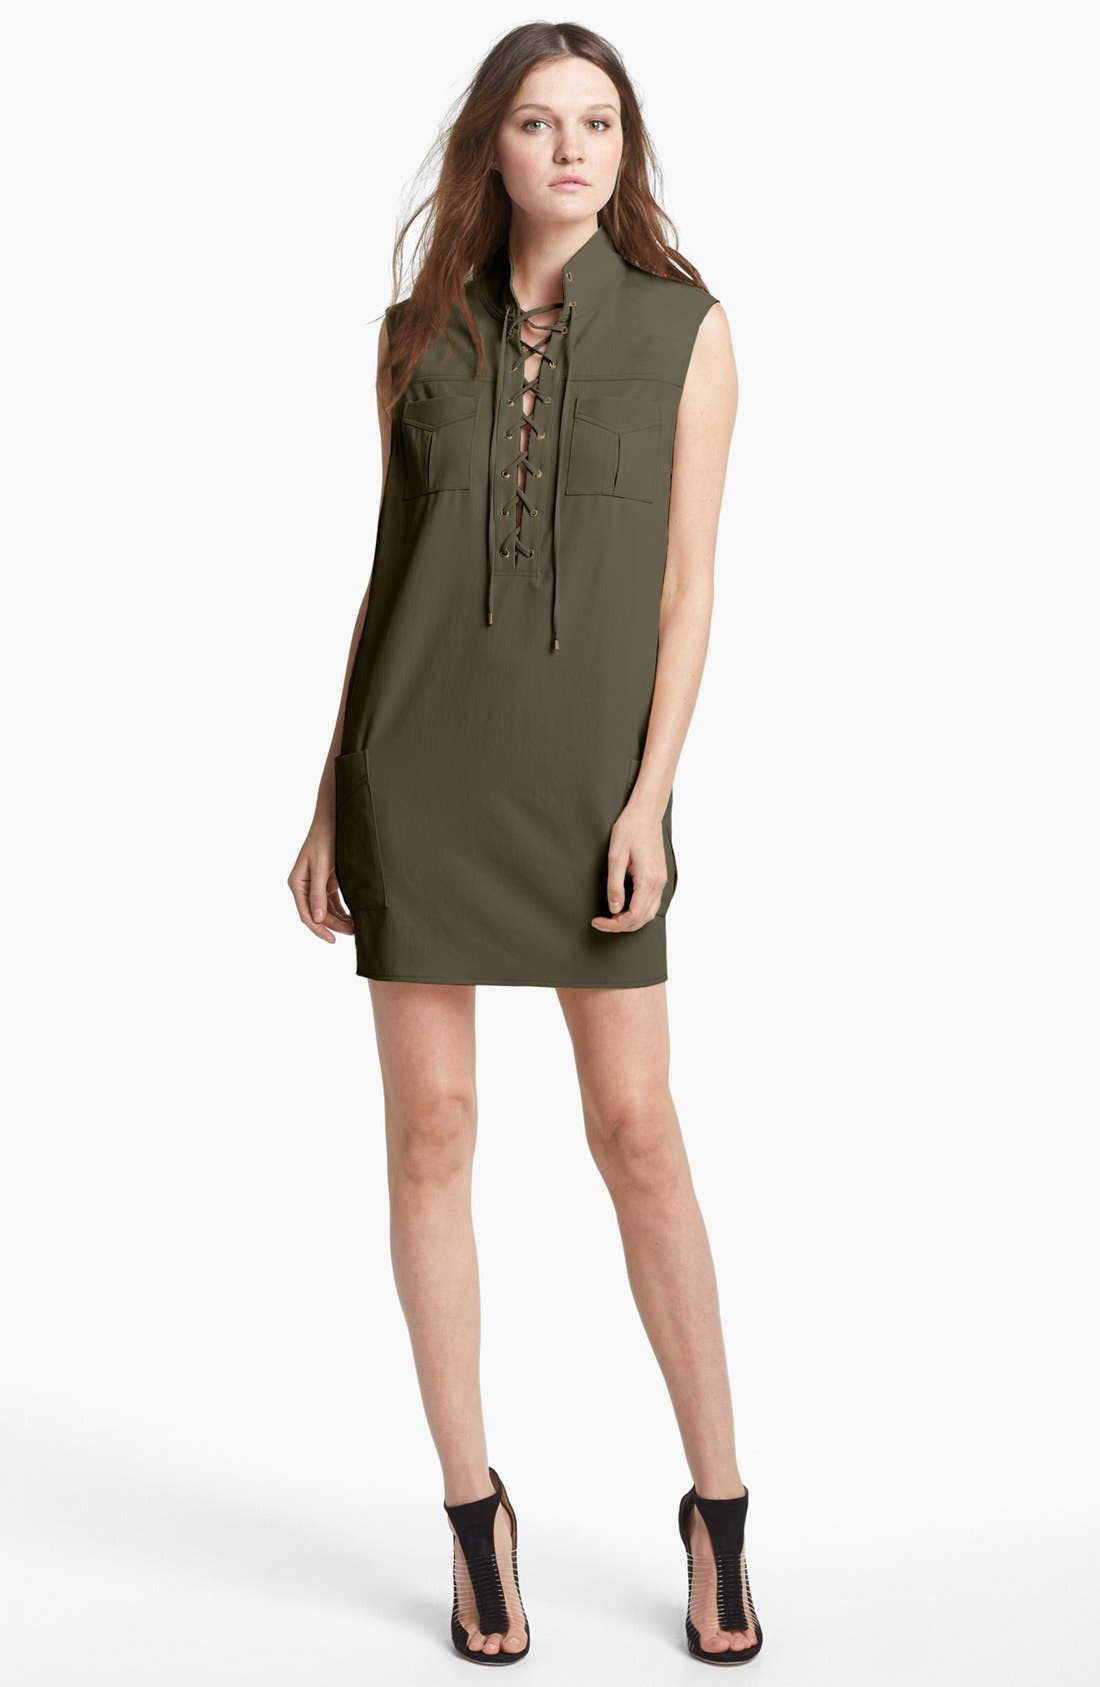 Alternate Image 1 Selected - Haute Hippie 'Safari' Sleeveless Dress